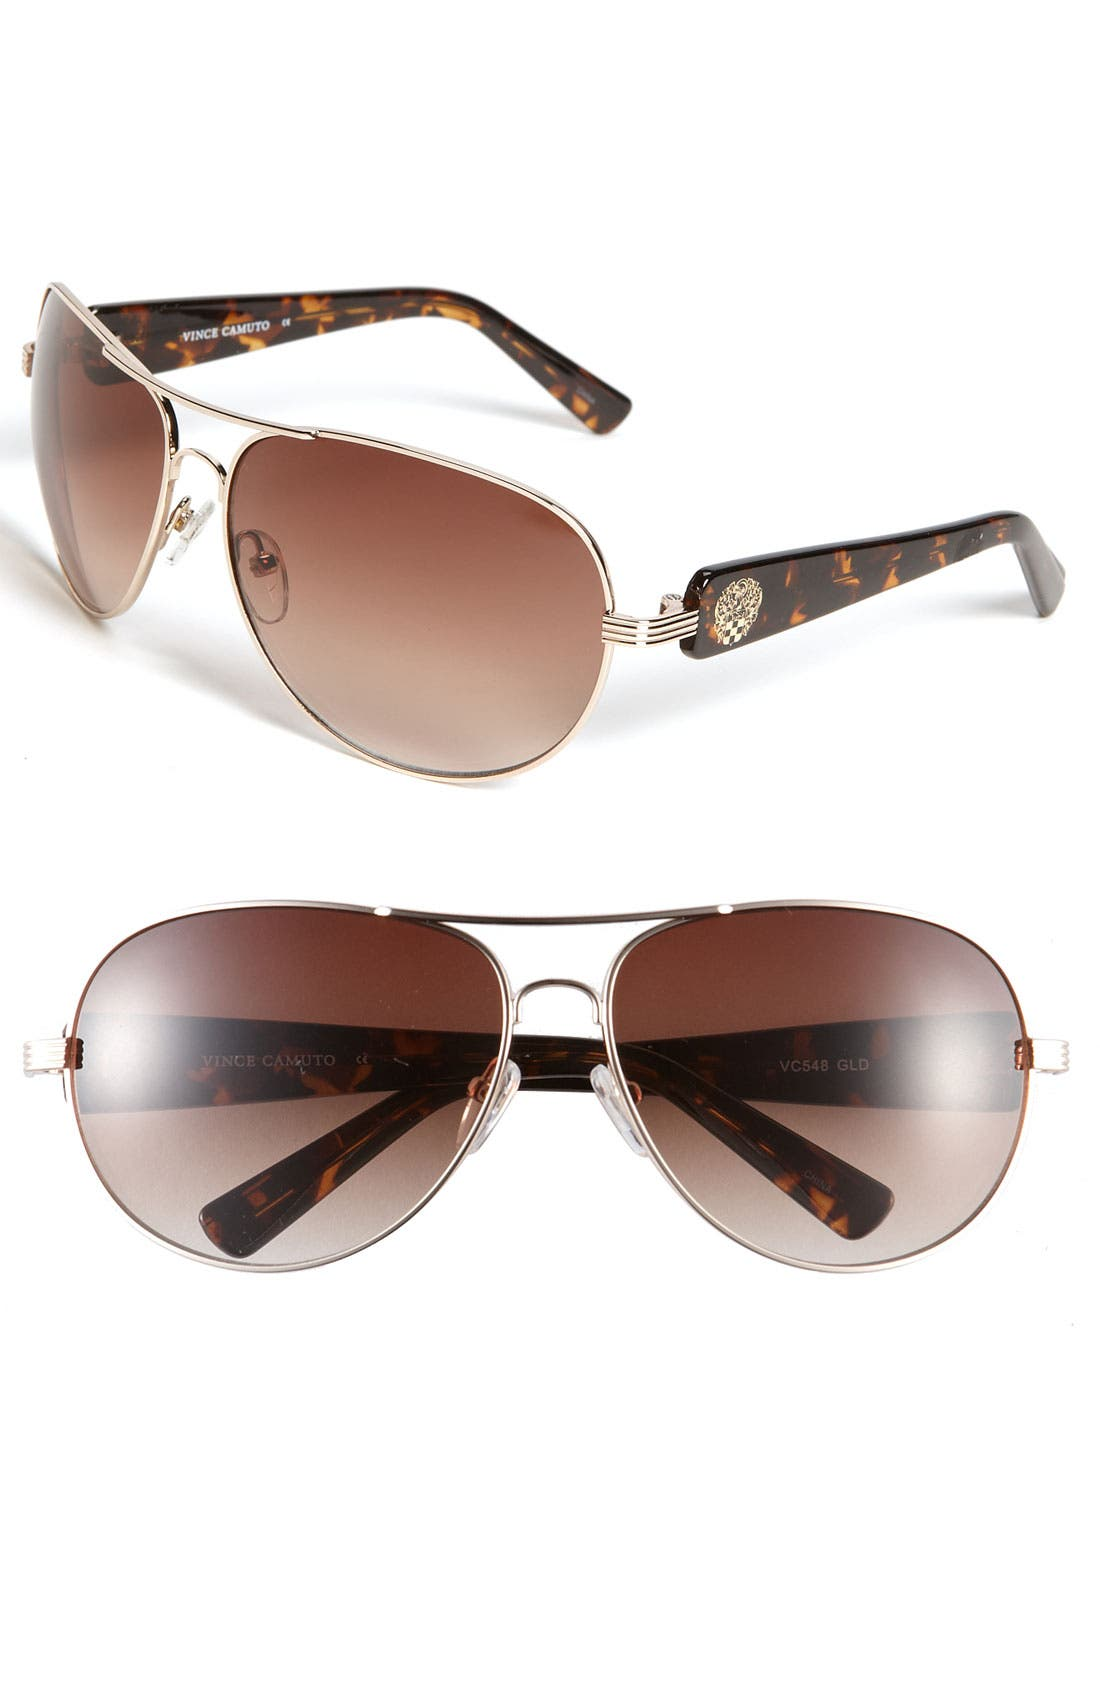 Main Image - Vince Camuto Metal Aviator Sunglasses